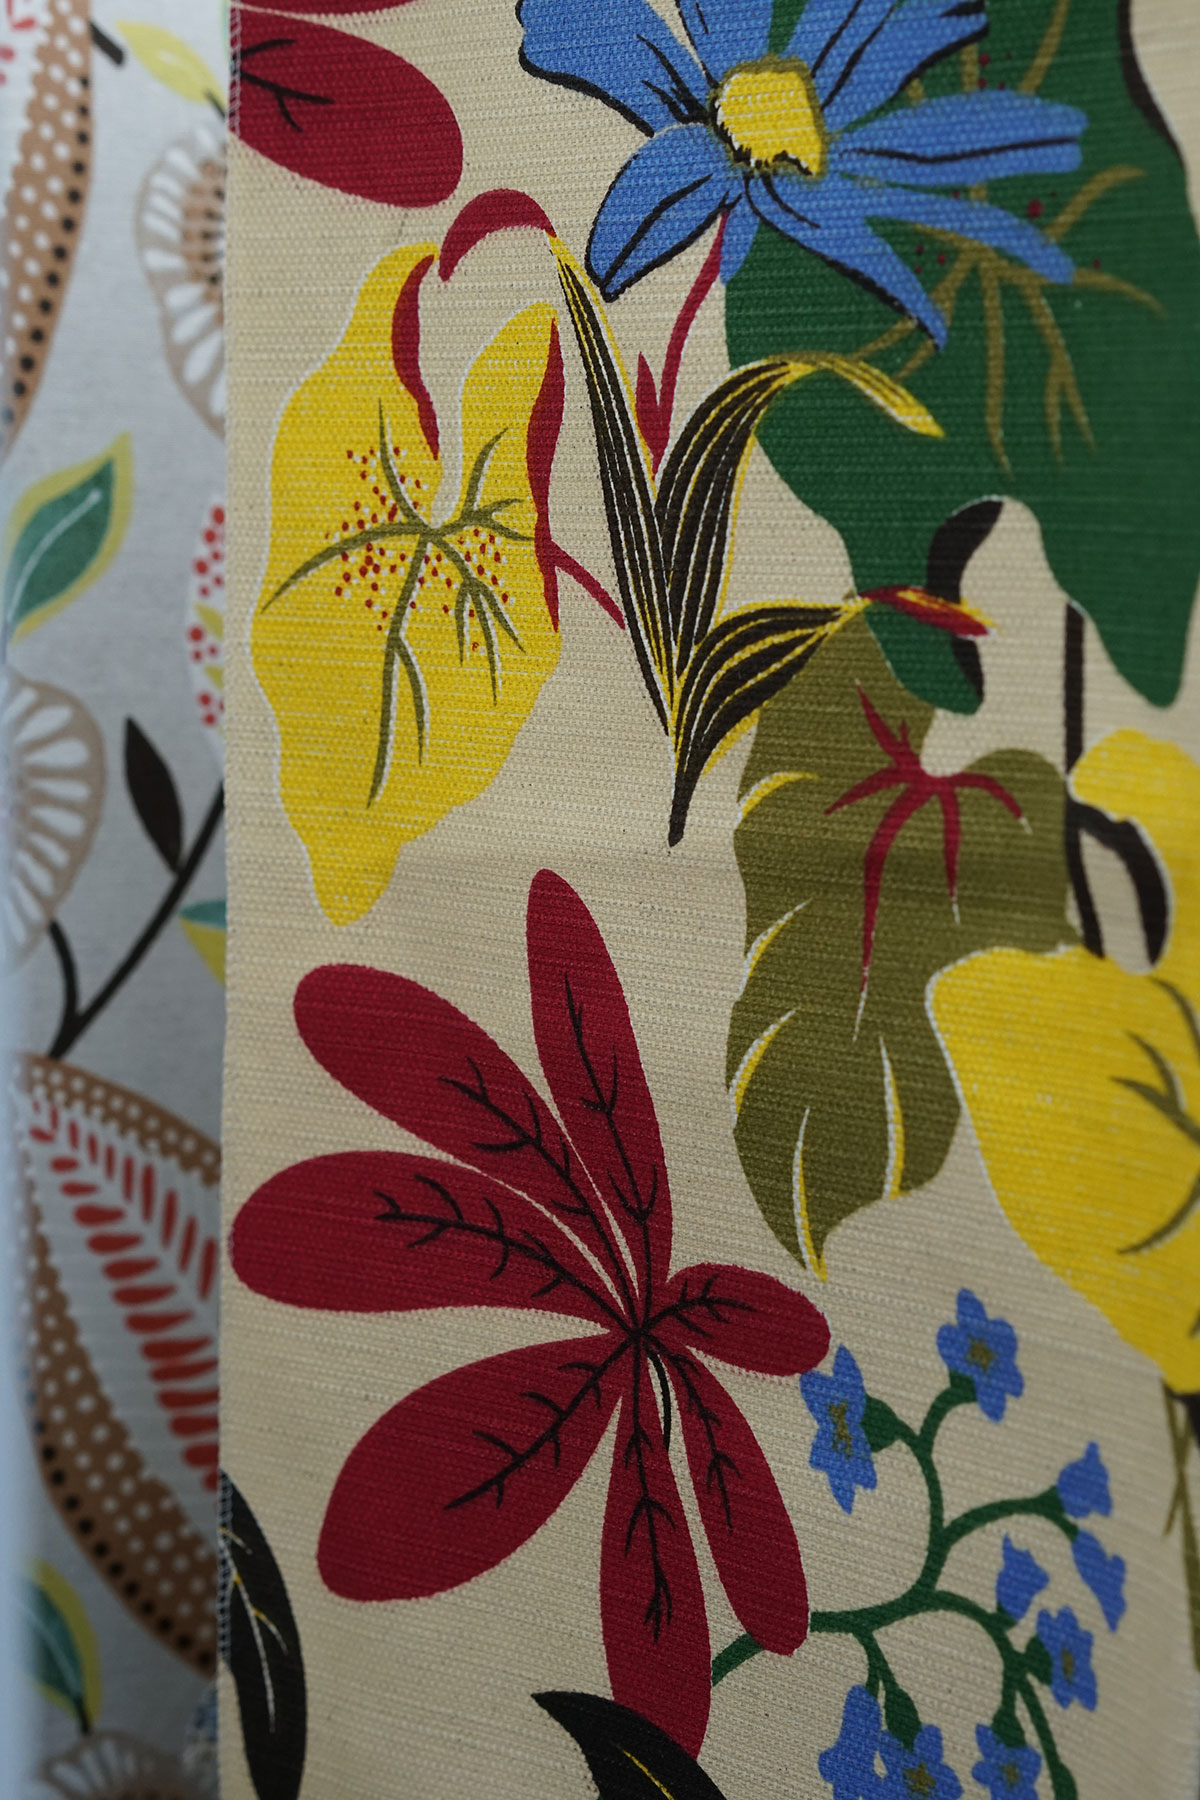 Abup Textil Cama Mesa Banho 19 Casa De Valentina -> Abup Textil